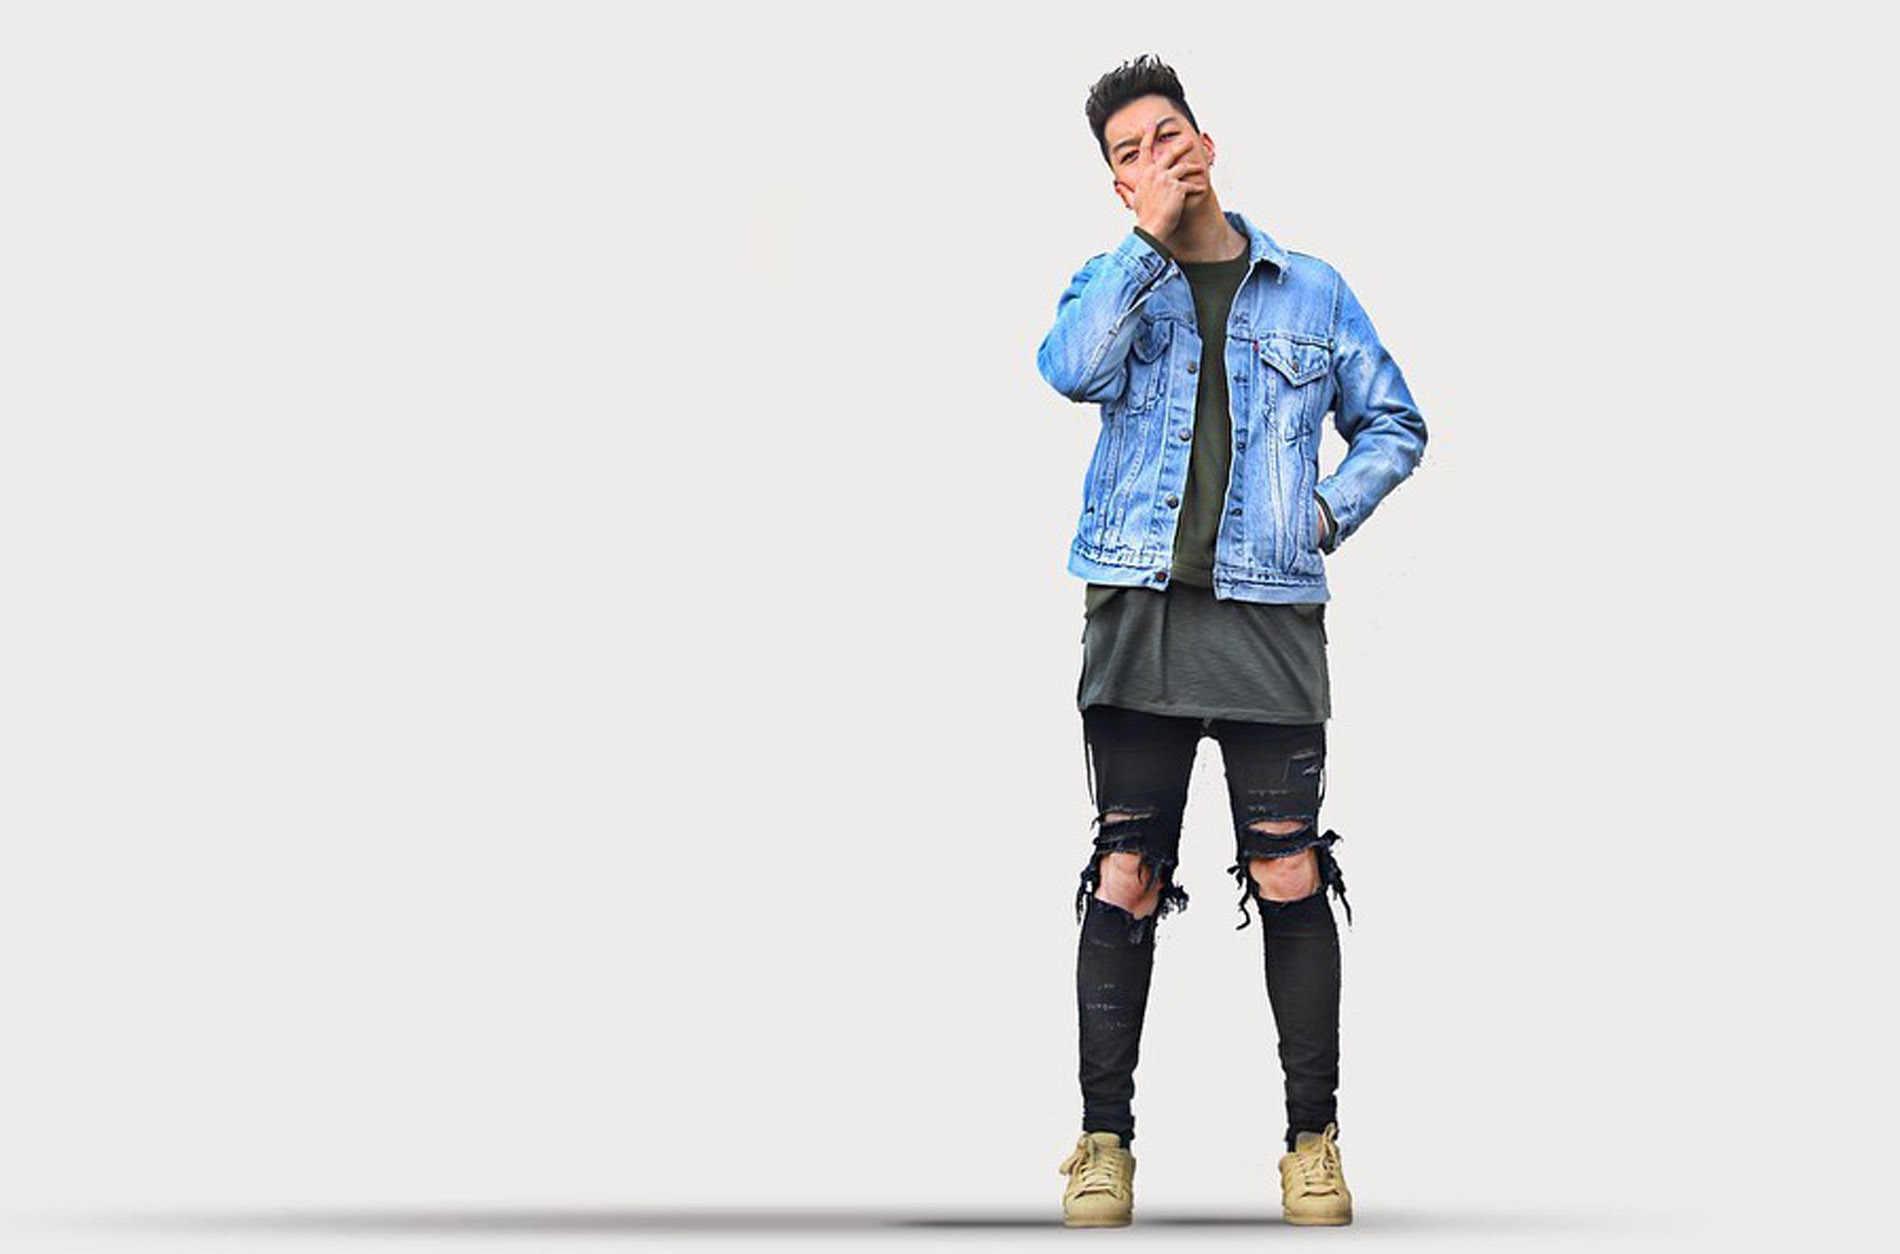 Strech Jeans Pantalones Vaqueros Ajustados Para Hombre Ropa Desgastada 2018 Pantalones Vaqueros Aliexpress